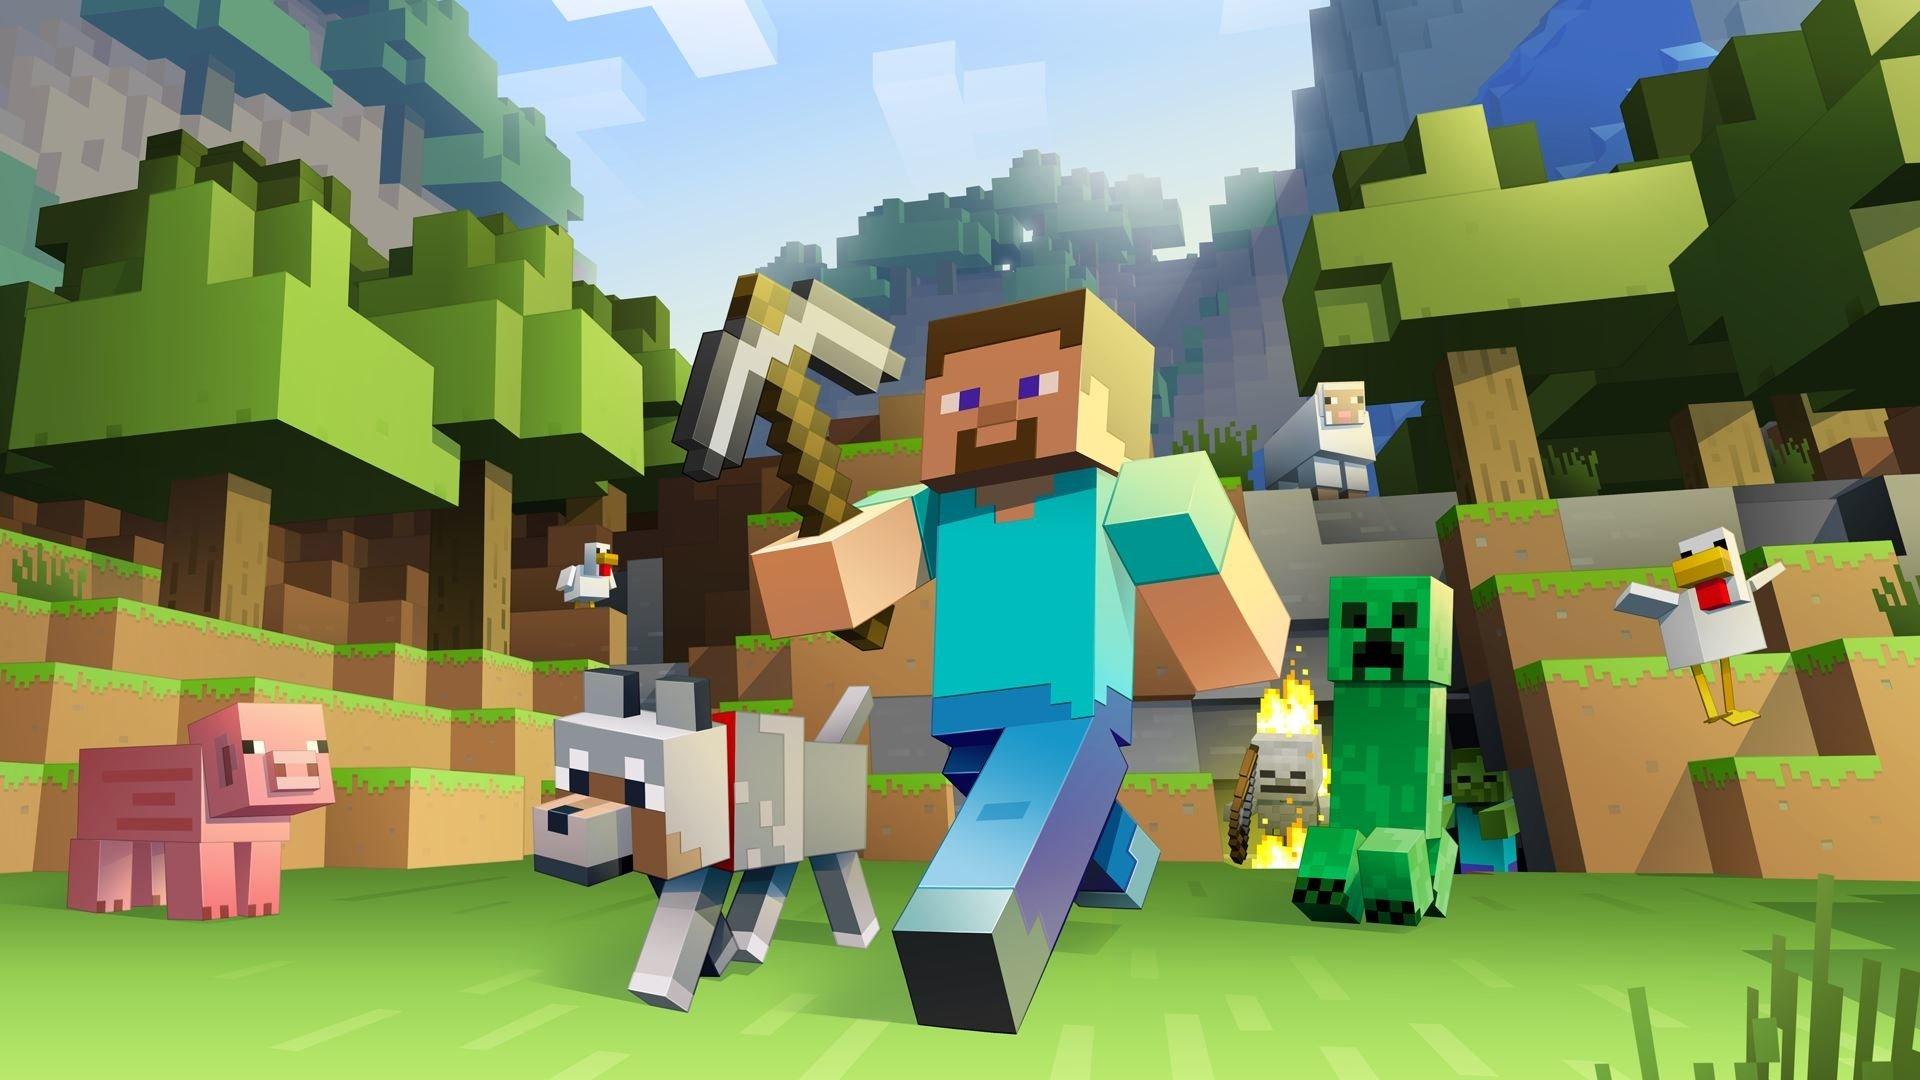 Minecraft Hd Wallpaper Background Image 1920x1080 Id 752070